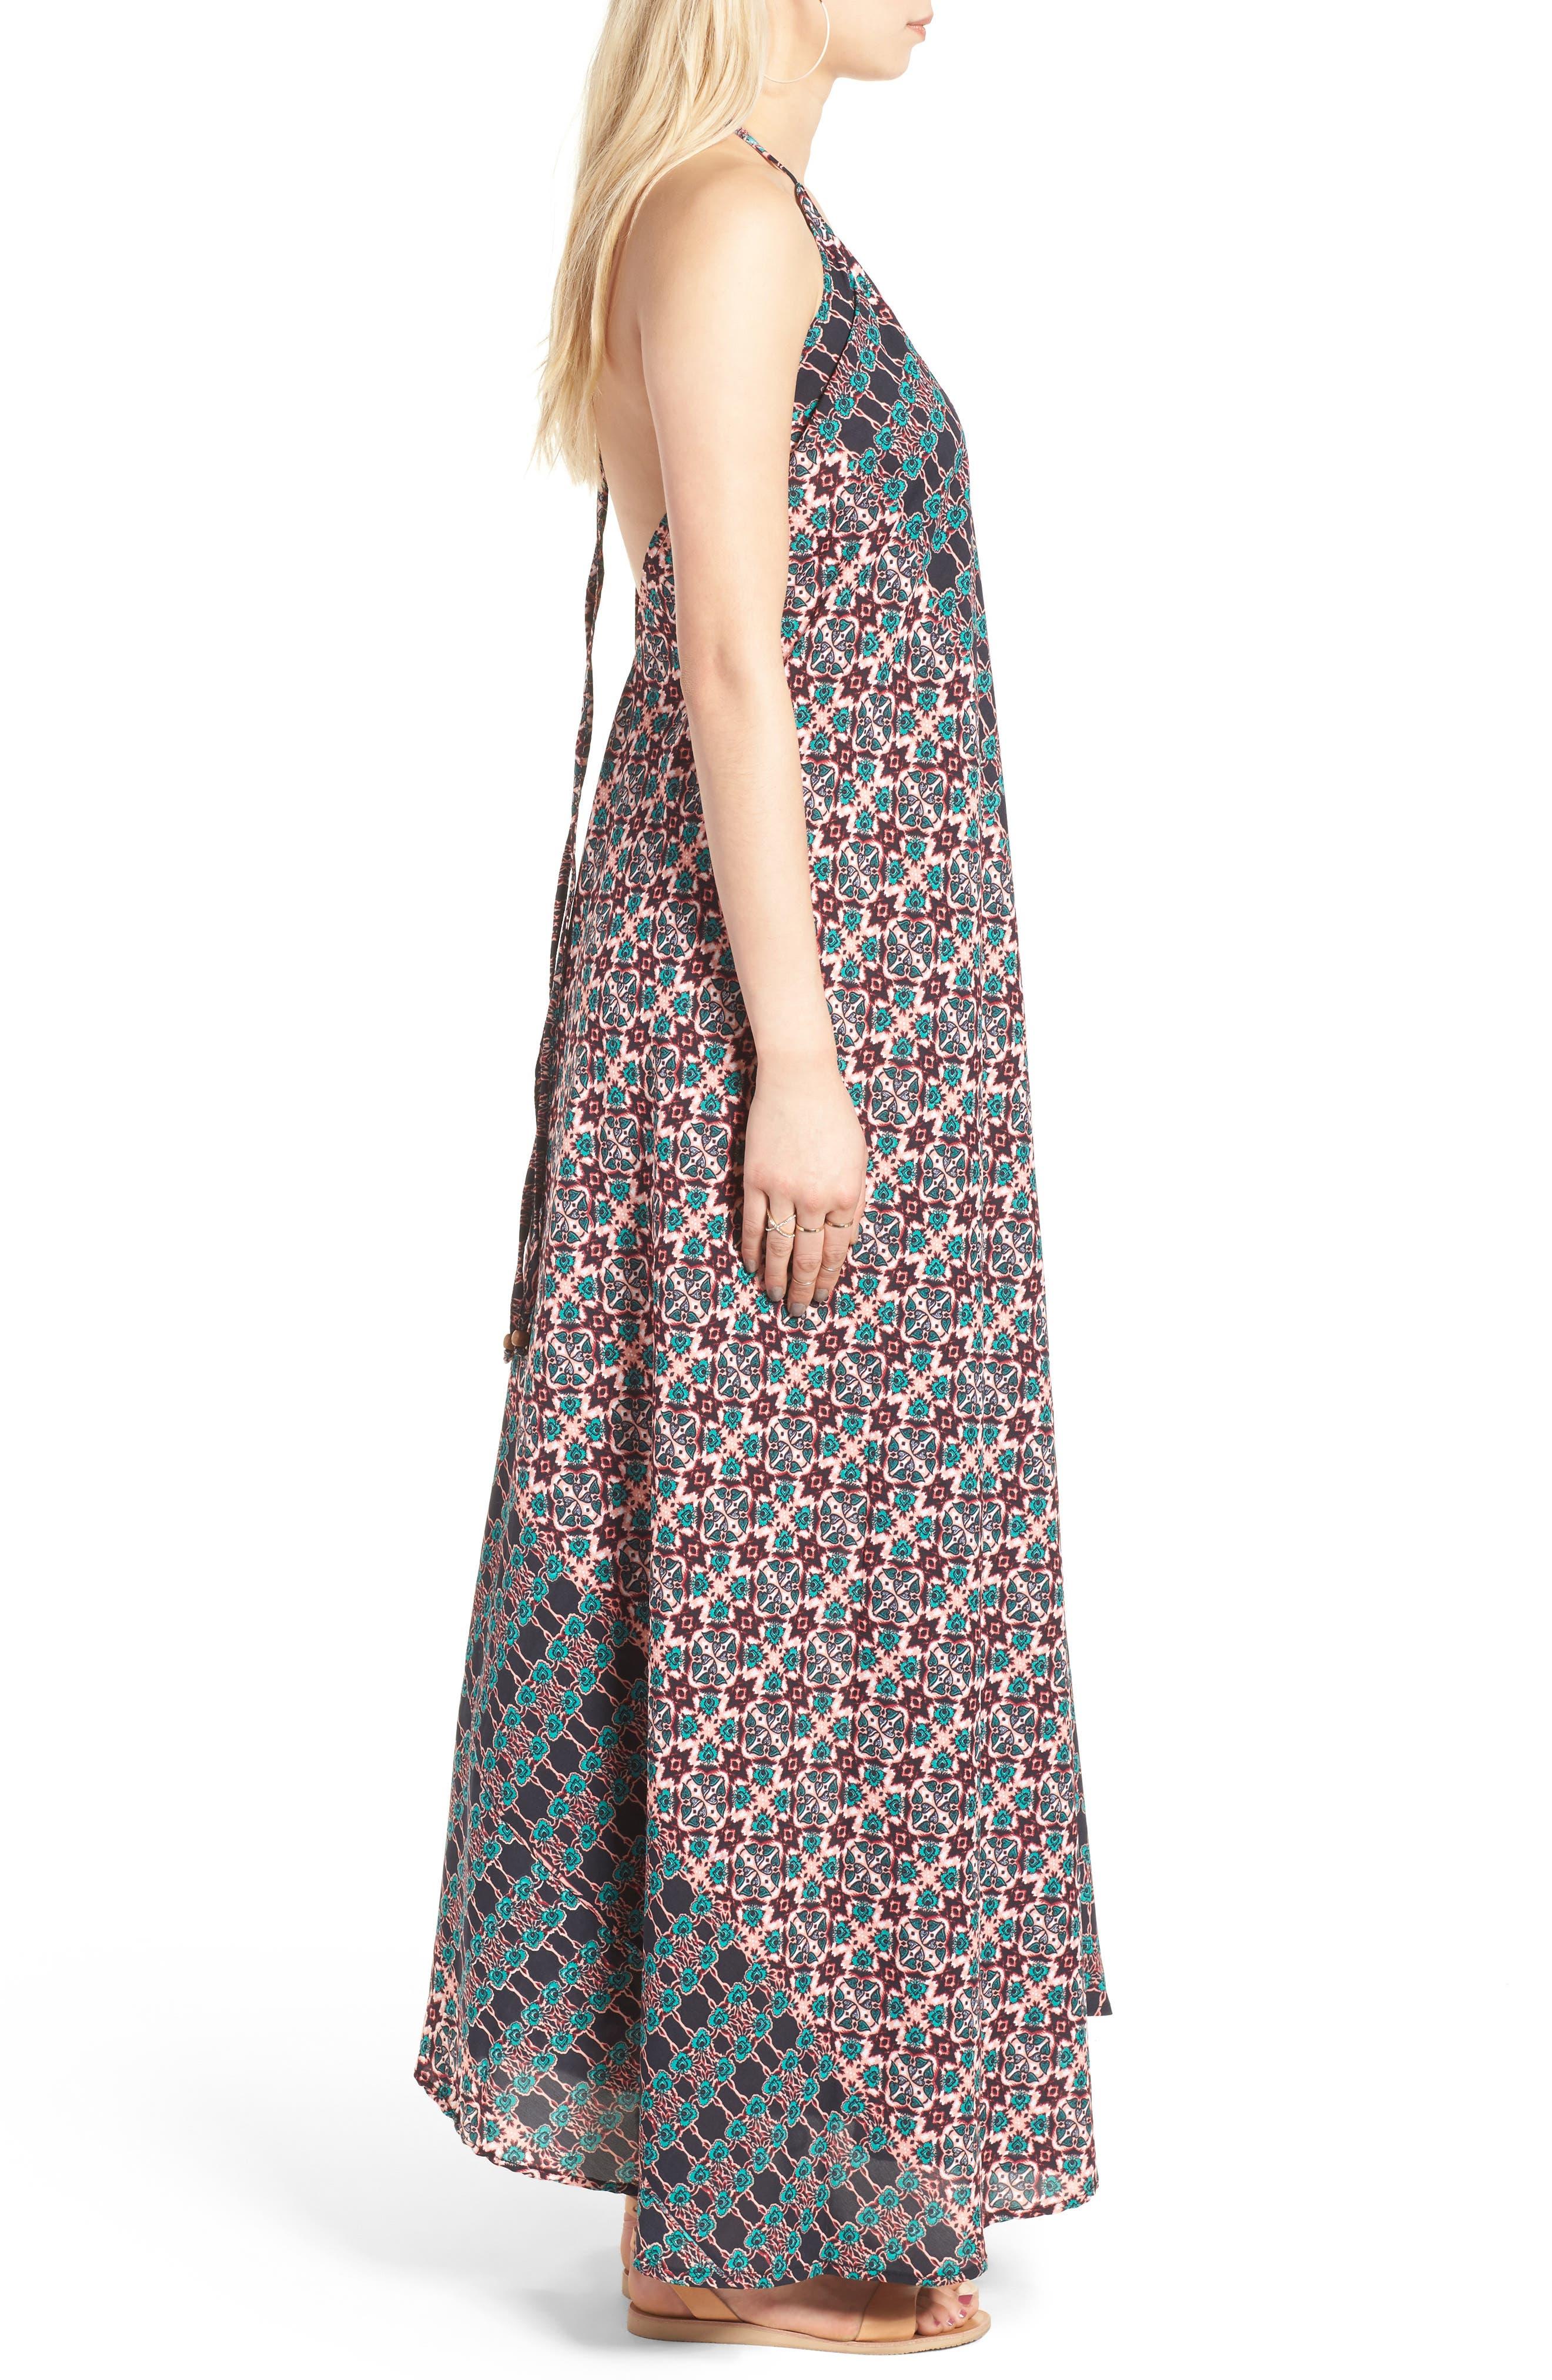 RAGA, Electric Nights Halter Maxi Dress, Alternate thumbnail 3, color, 001